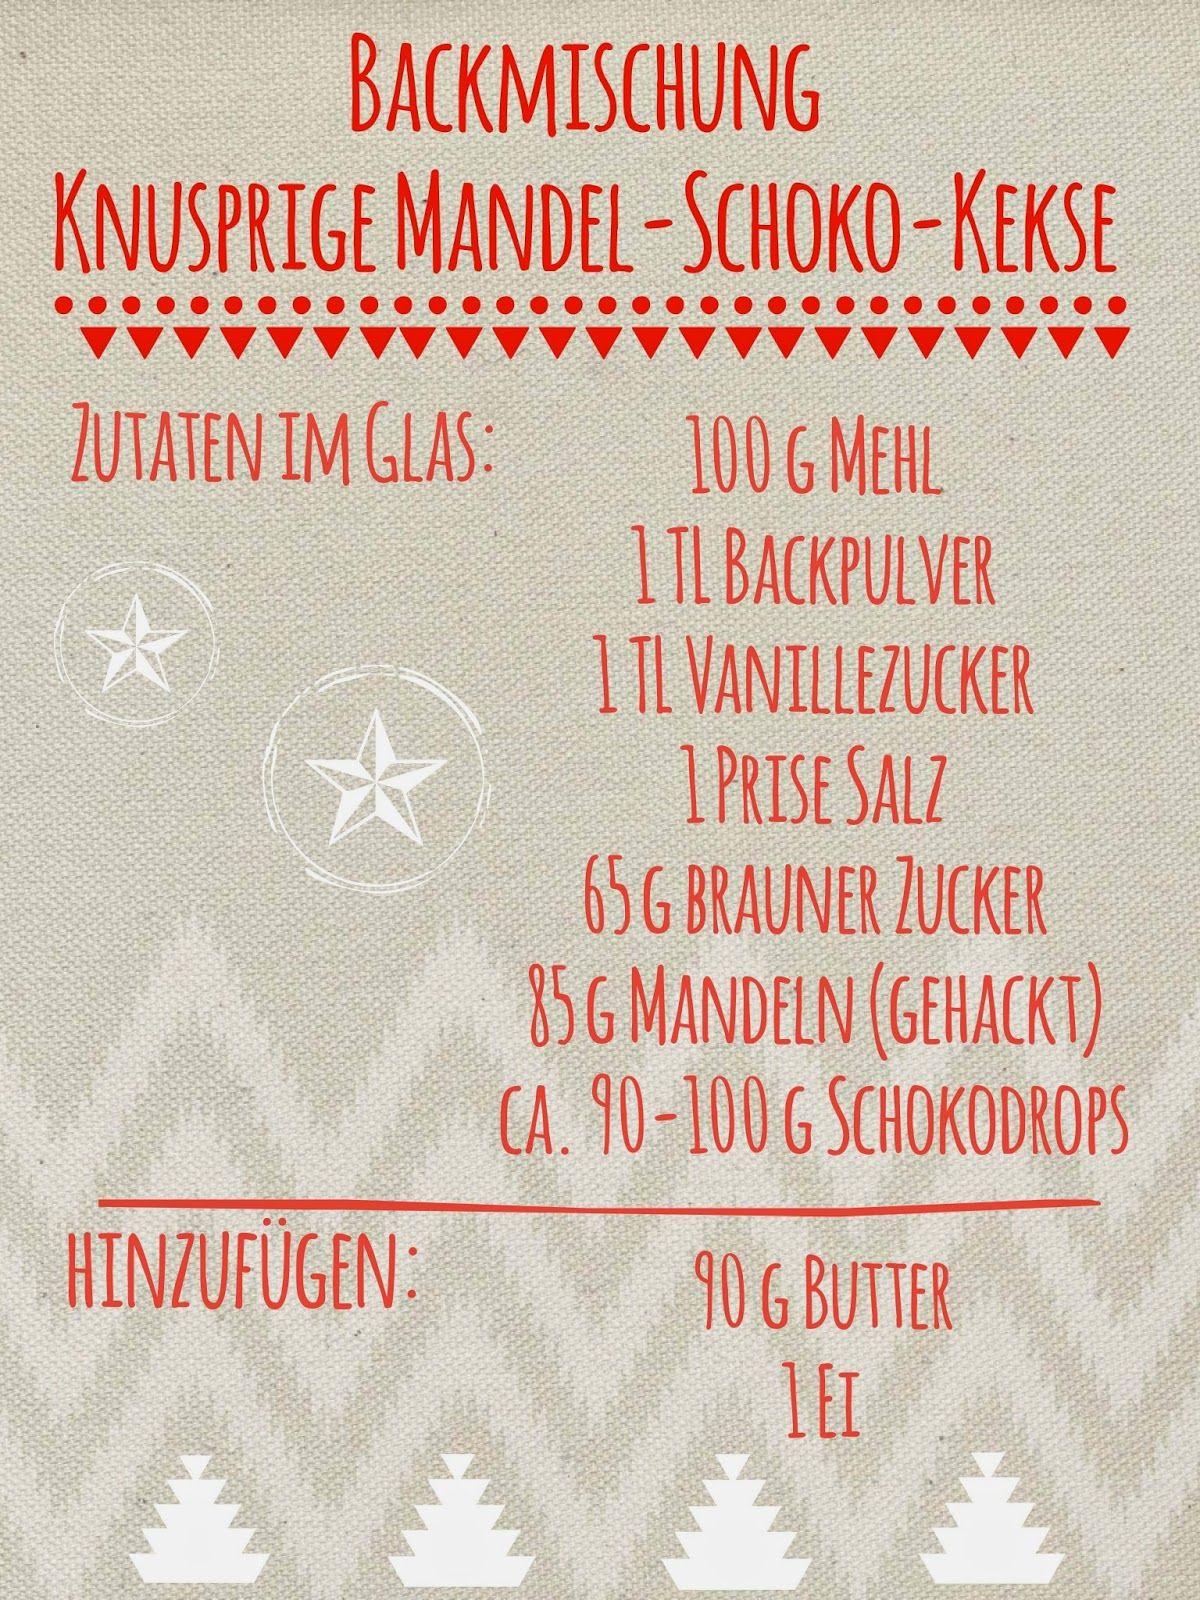 Backmischung im Glas: Knusprige Mandel-Schoko-Kekse | Geschenke ...